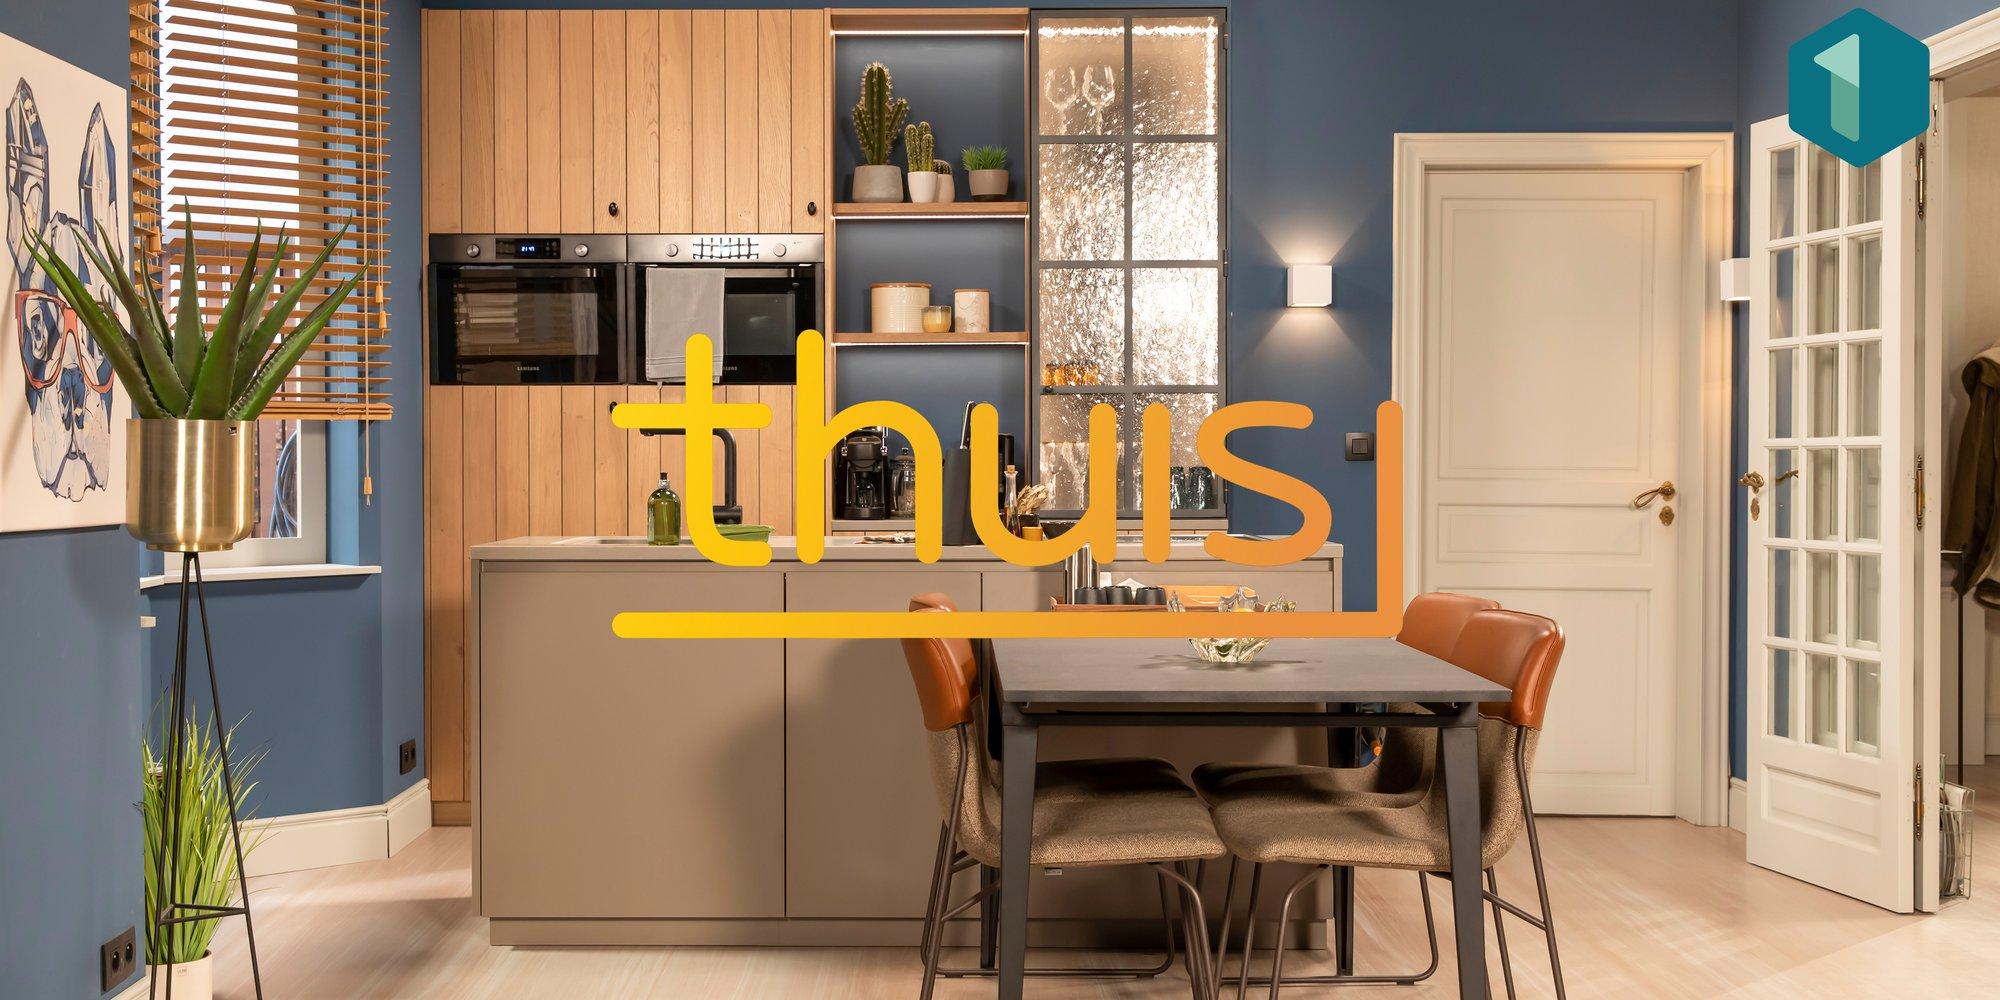 Keuken in één tv programma Thuis Kobe